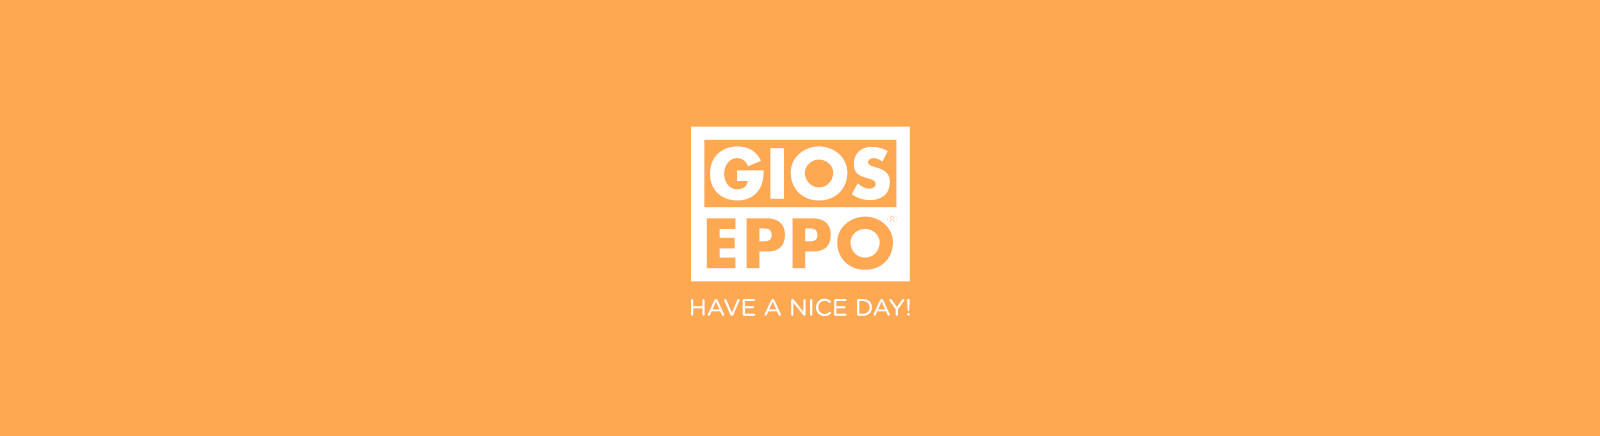 Prange: gioseppo Sandalen für Kinder online shoppen